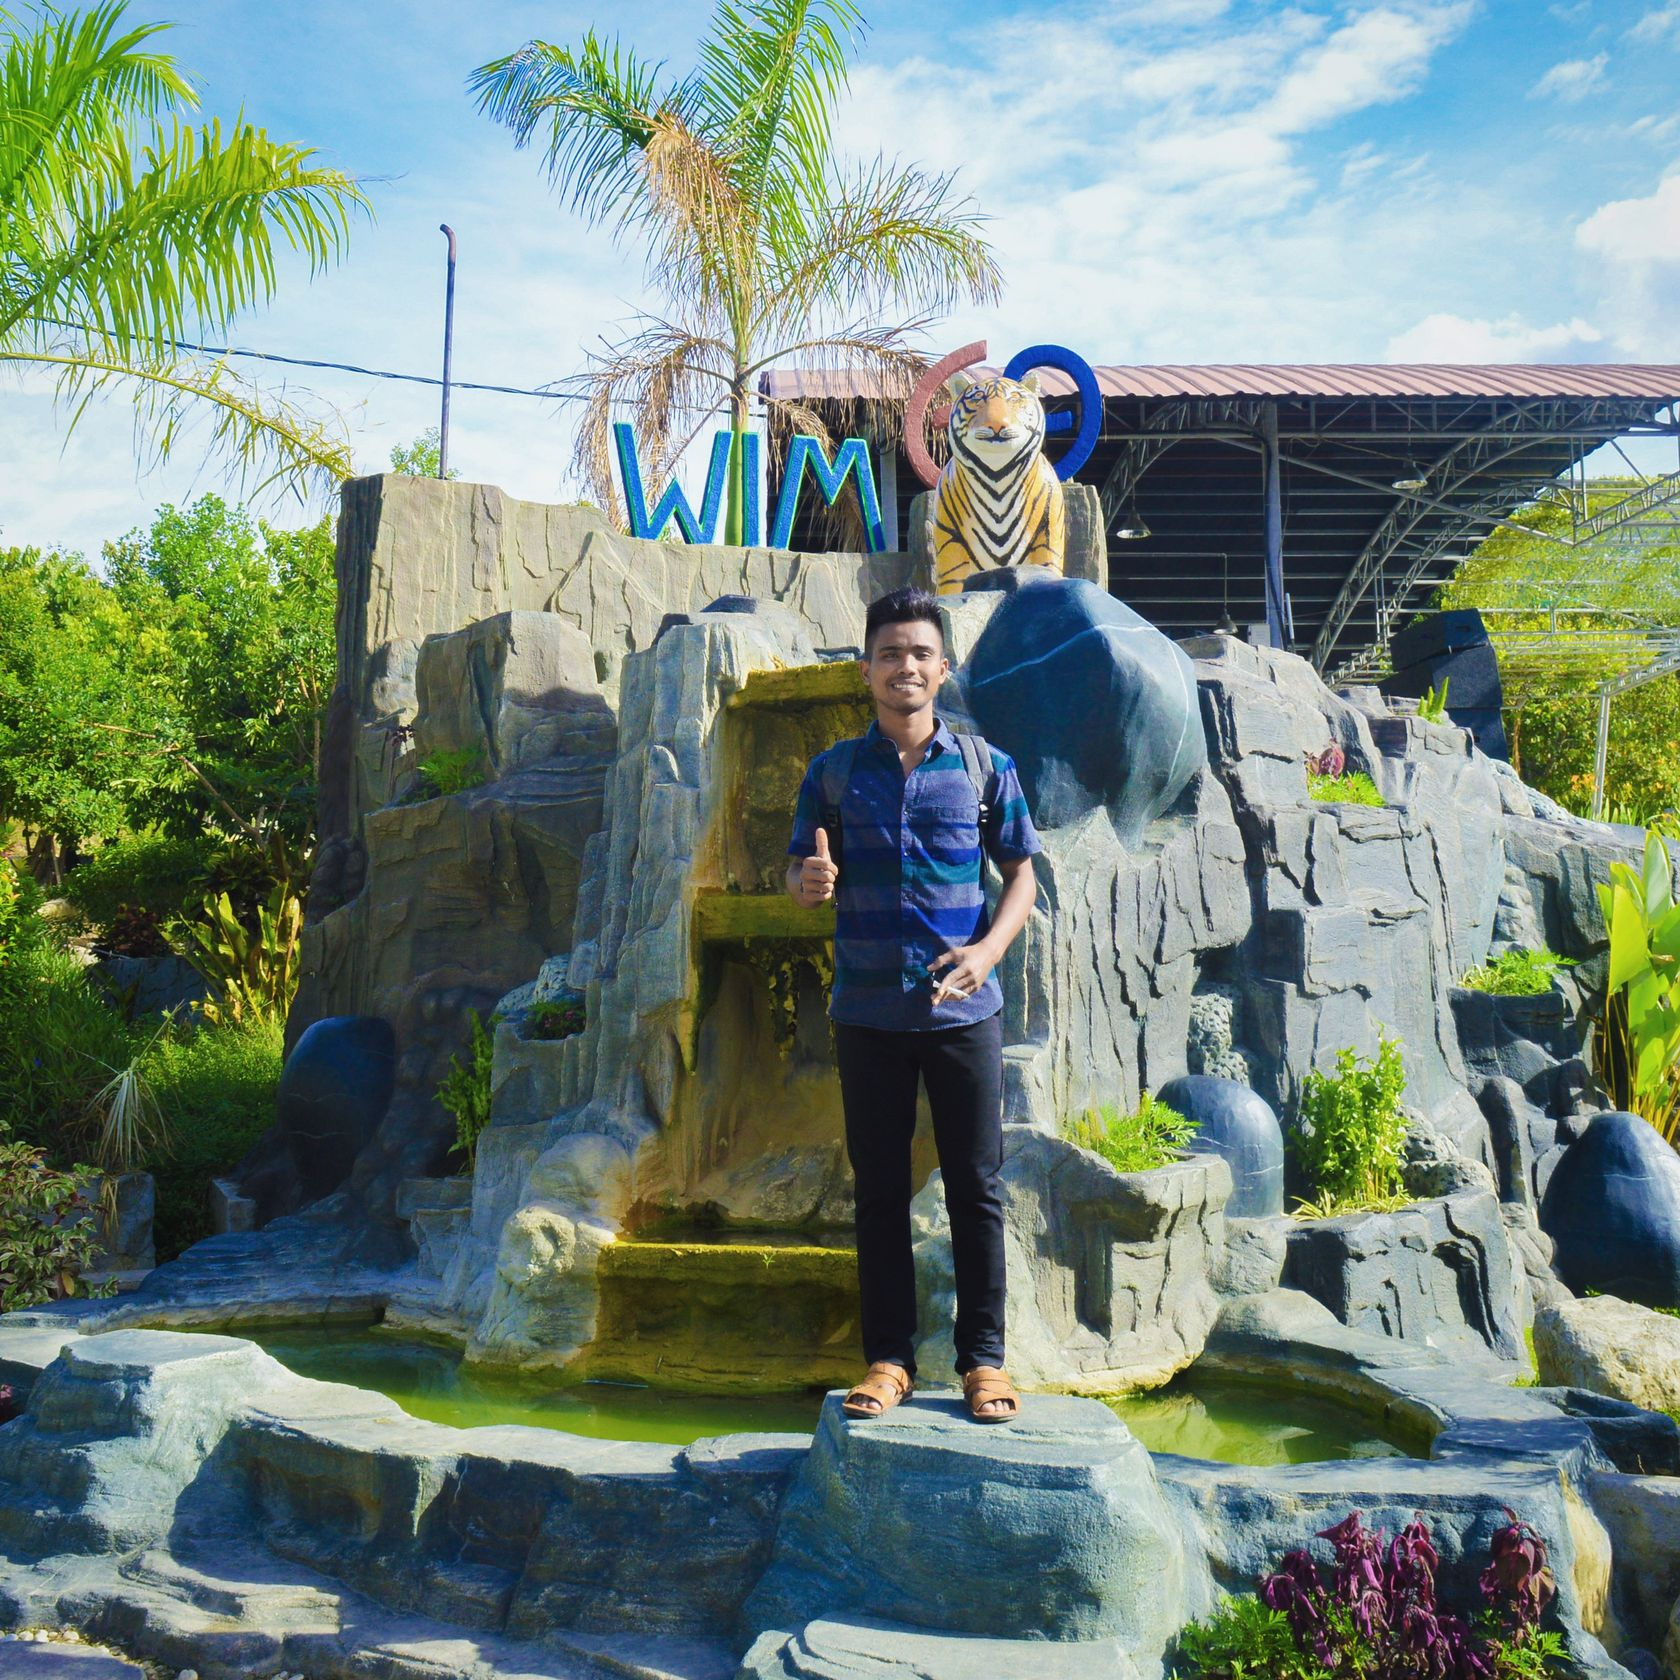 Wim 69 Wahana Impian Malaka Aceh Besar Steemit Waterboom Kuta